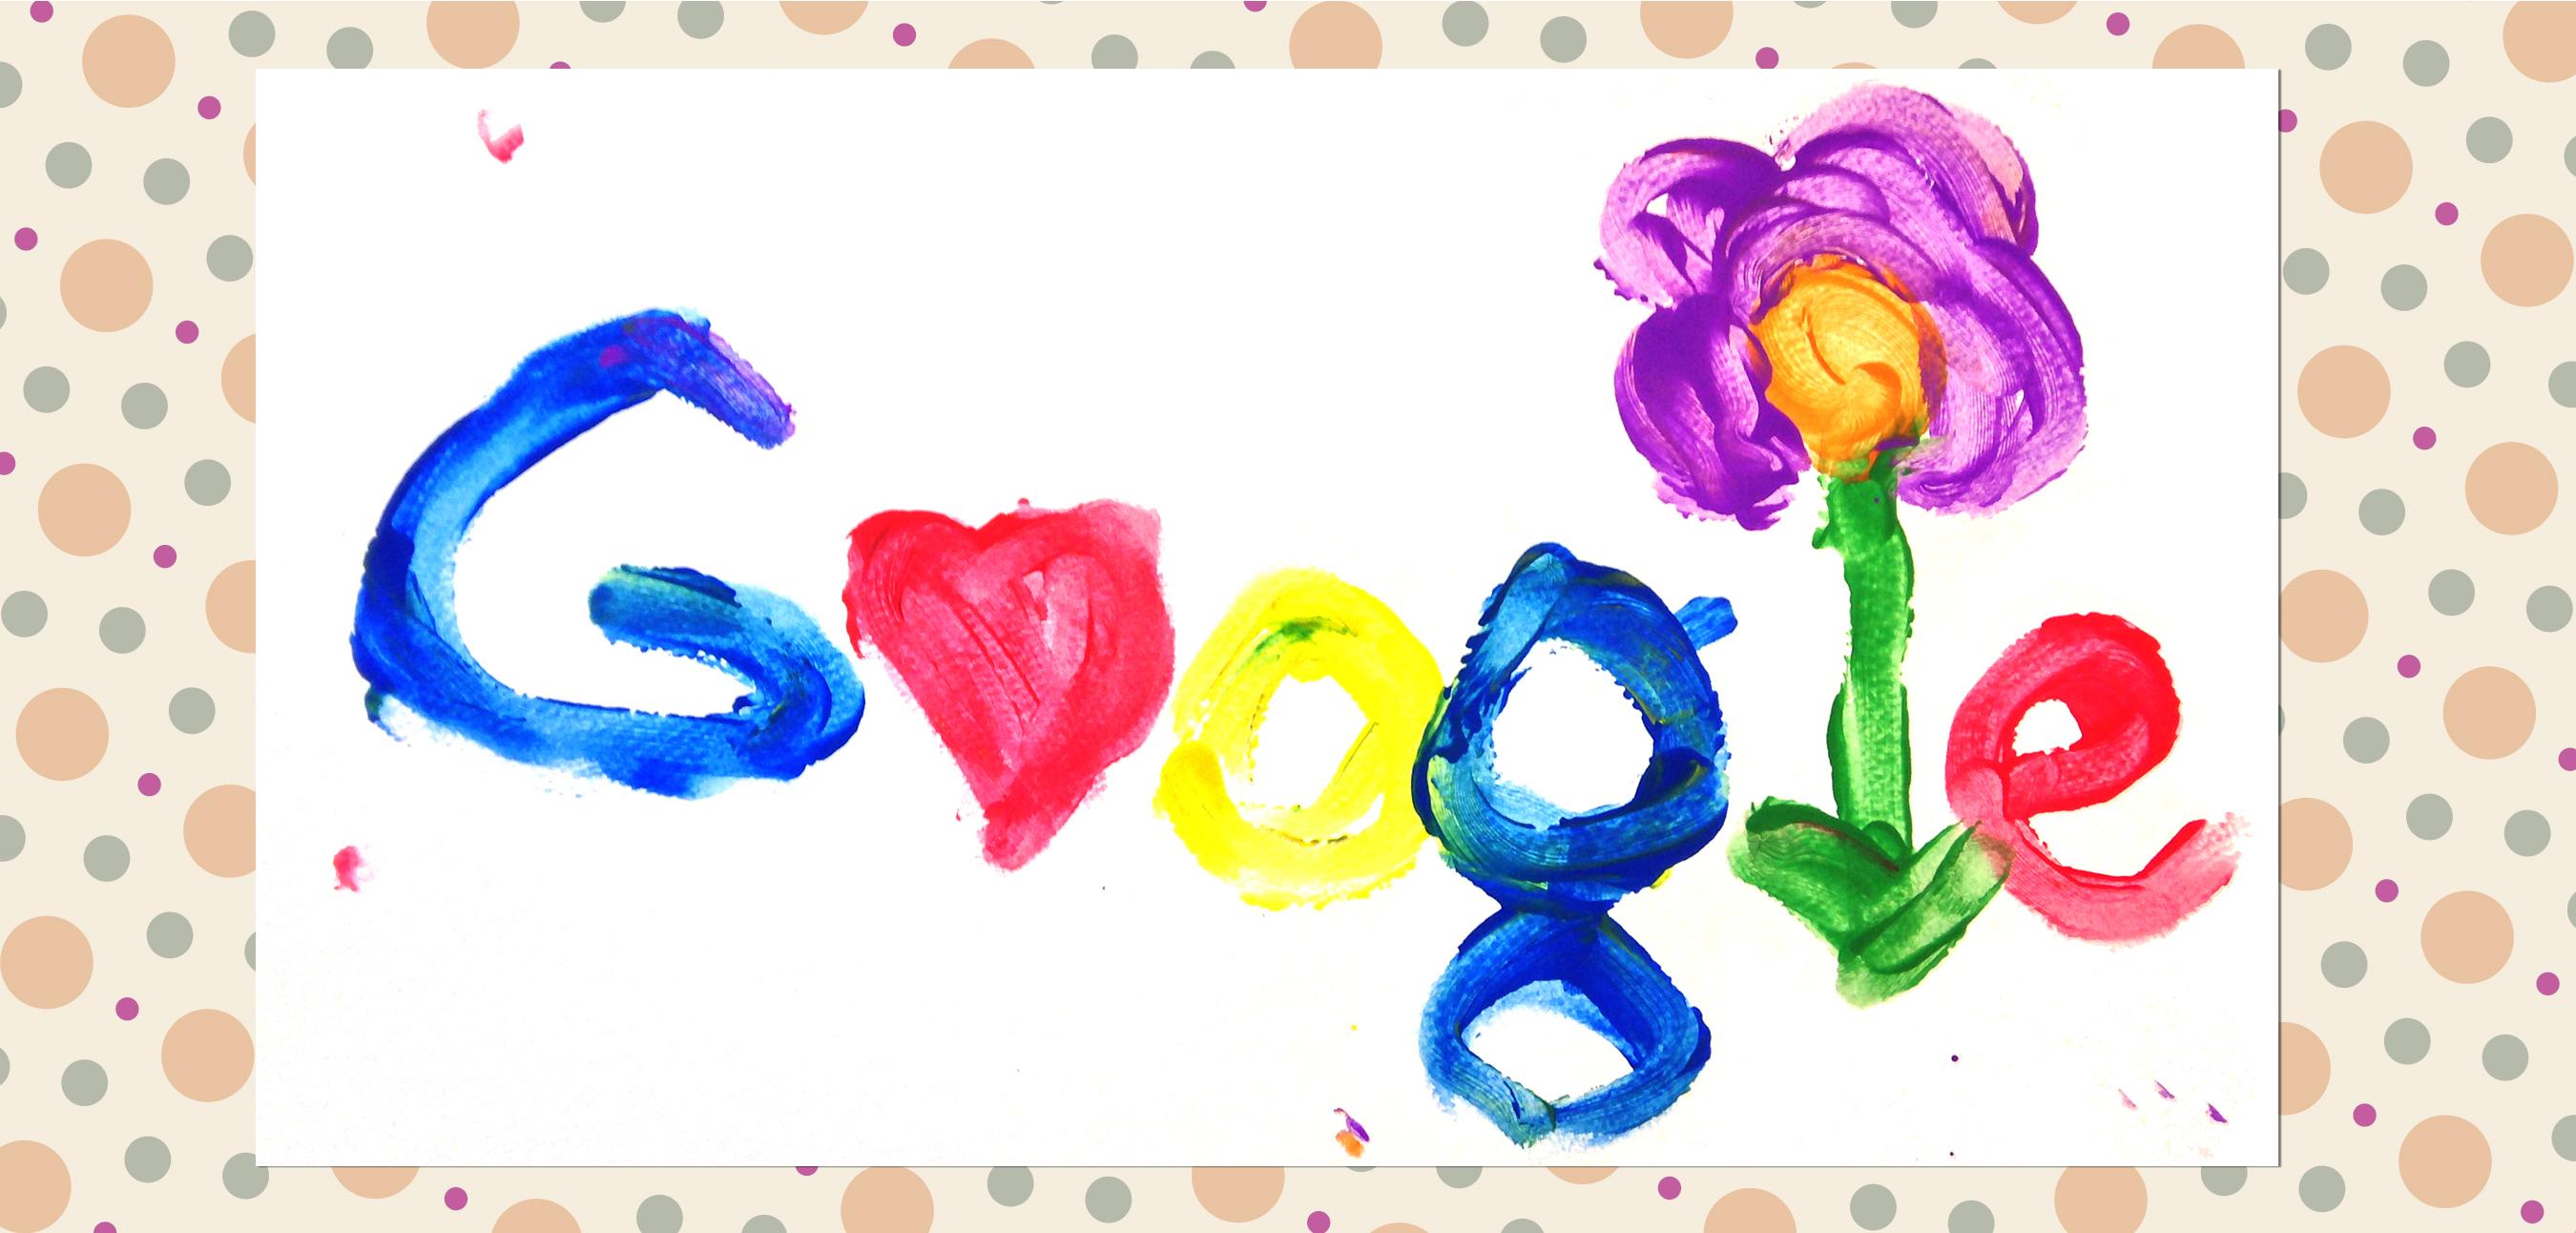 google hd logos wallpaper hd logos of companies